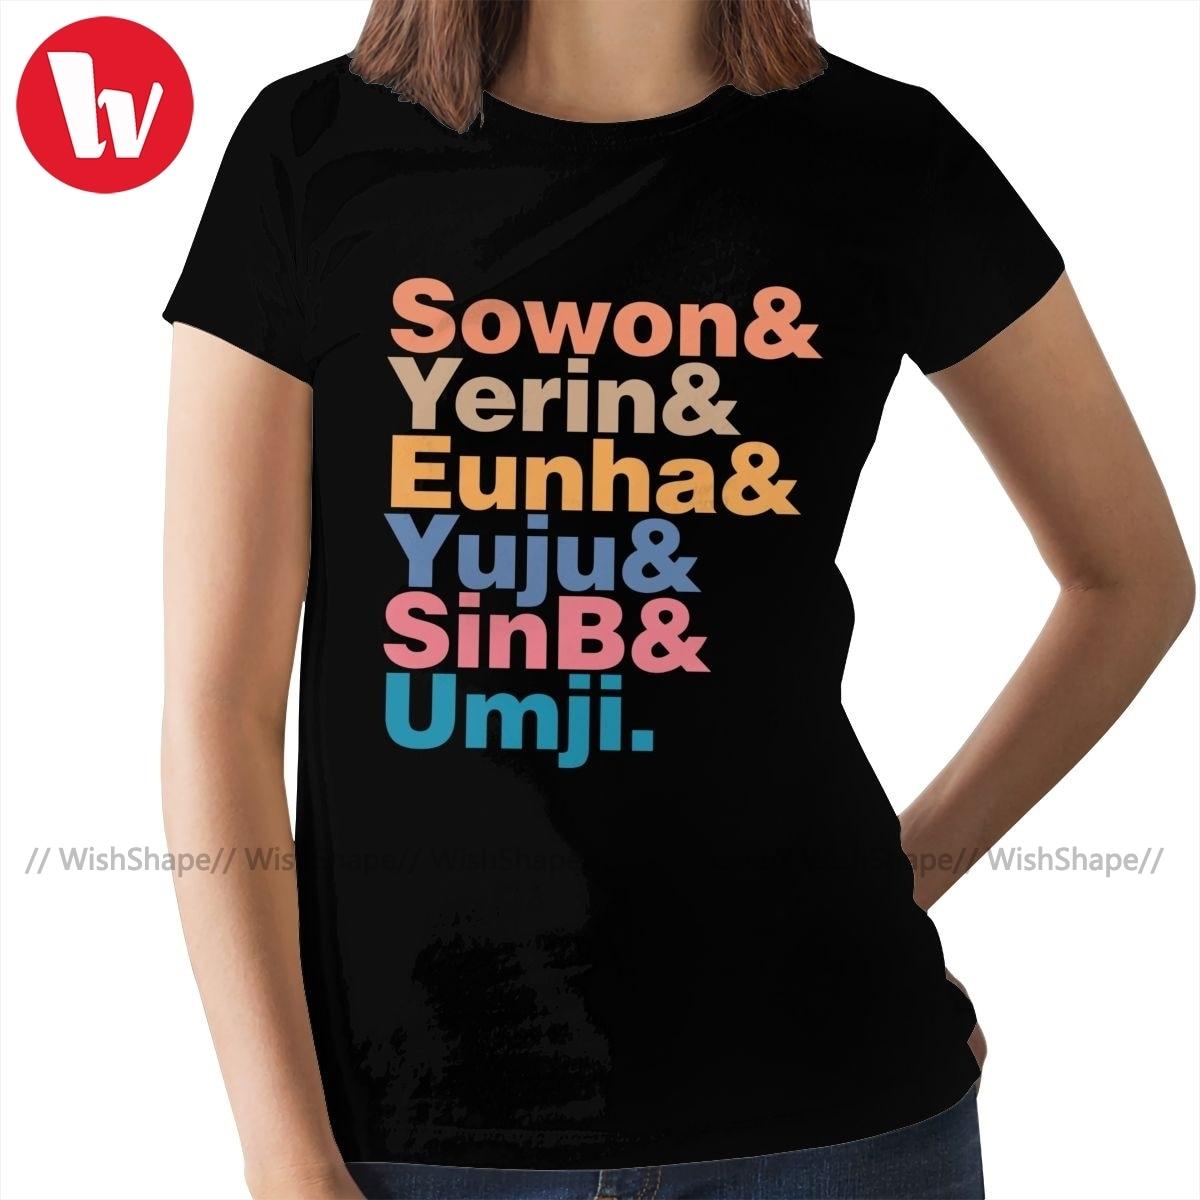 Camiseta Gfriend Kpop, camiseta GFRIEND In Helvetica, camiseta roja de manga corta para mujer, Camiseta de cuello redondo para mujer